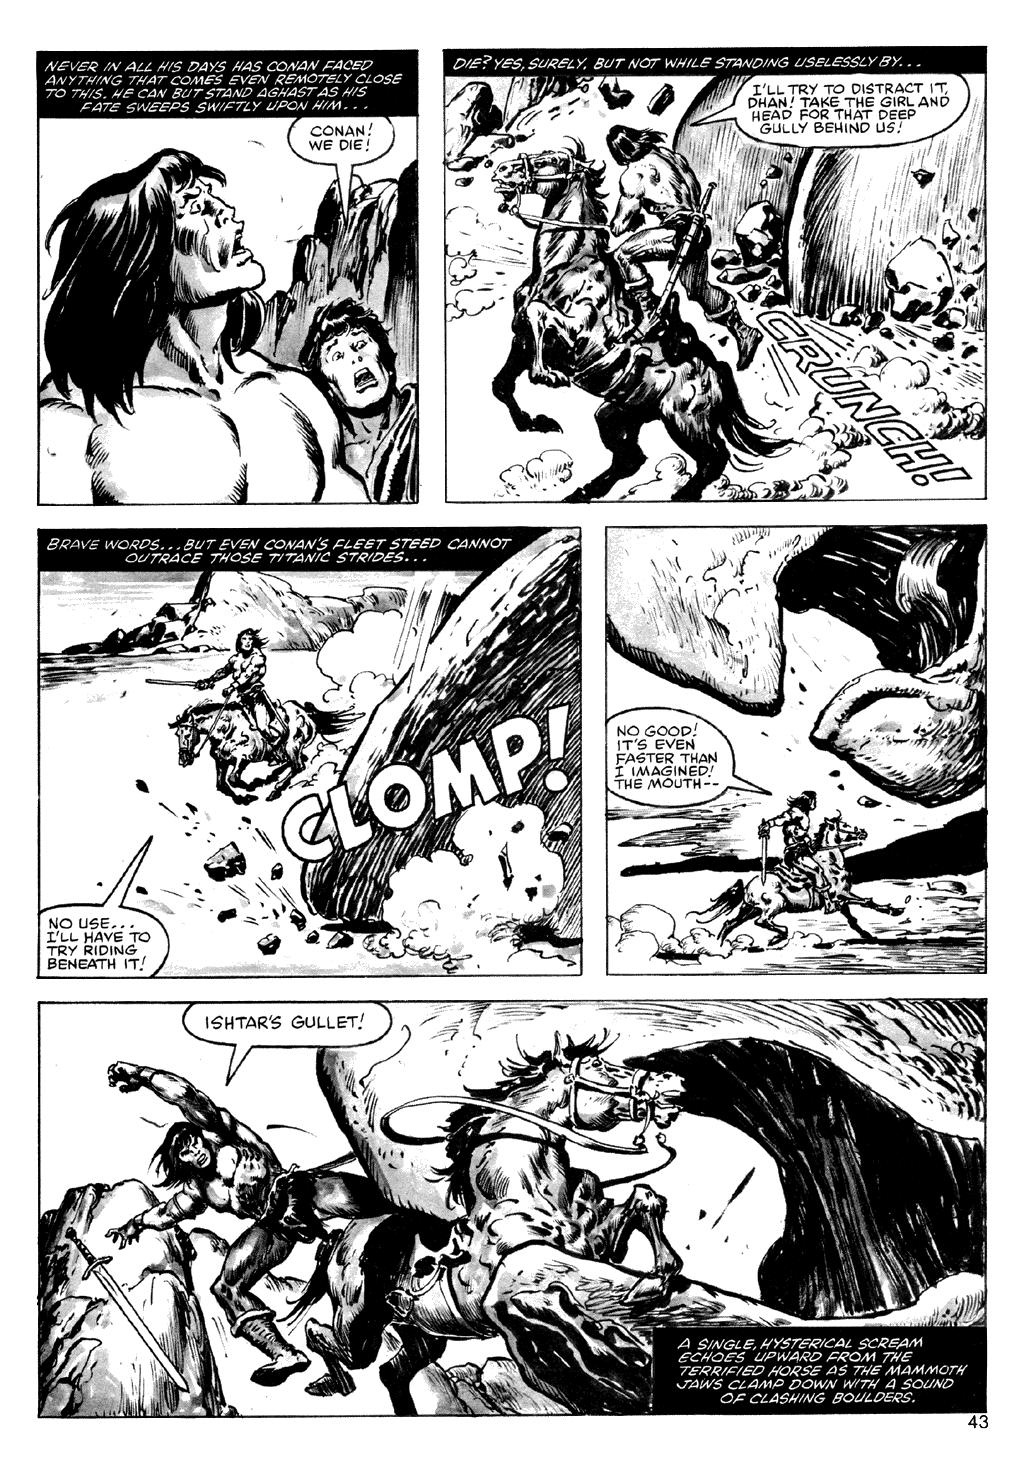 Of Conan  #164 - English 43